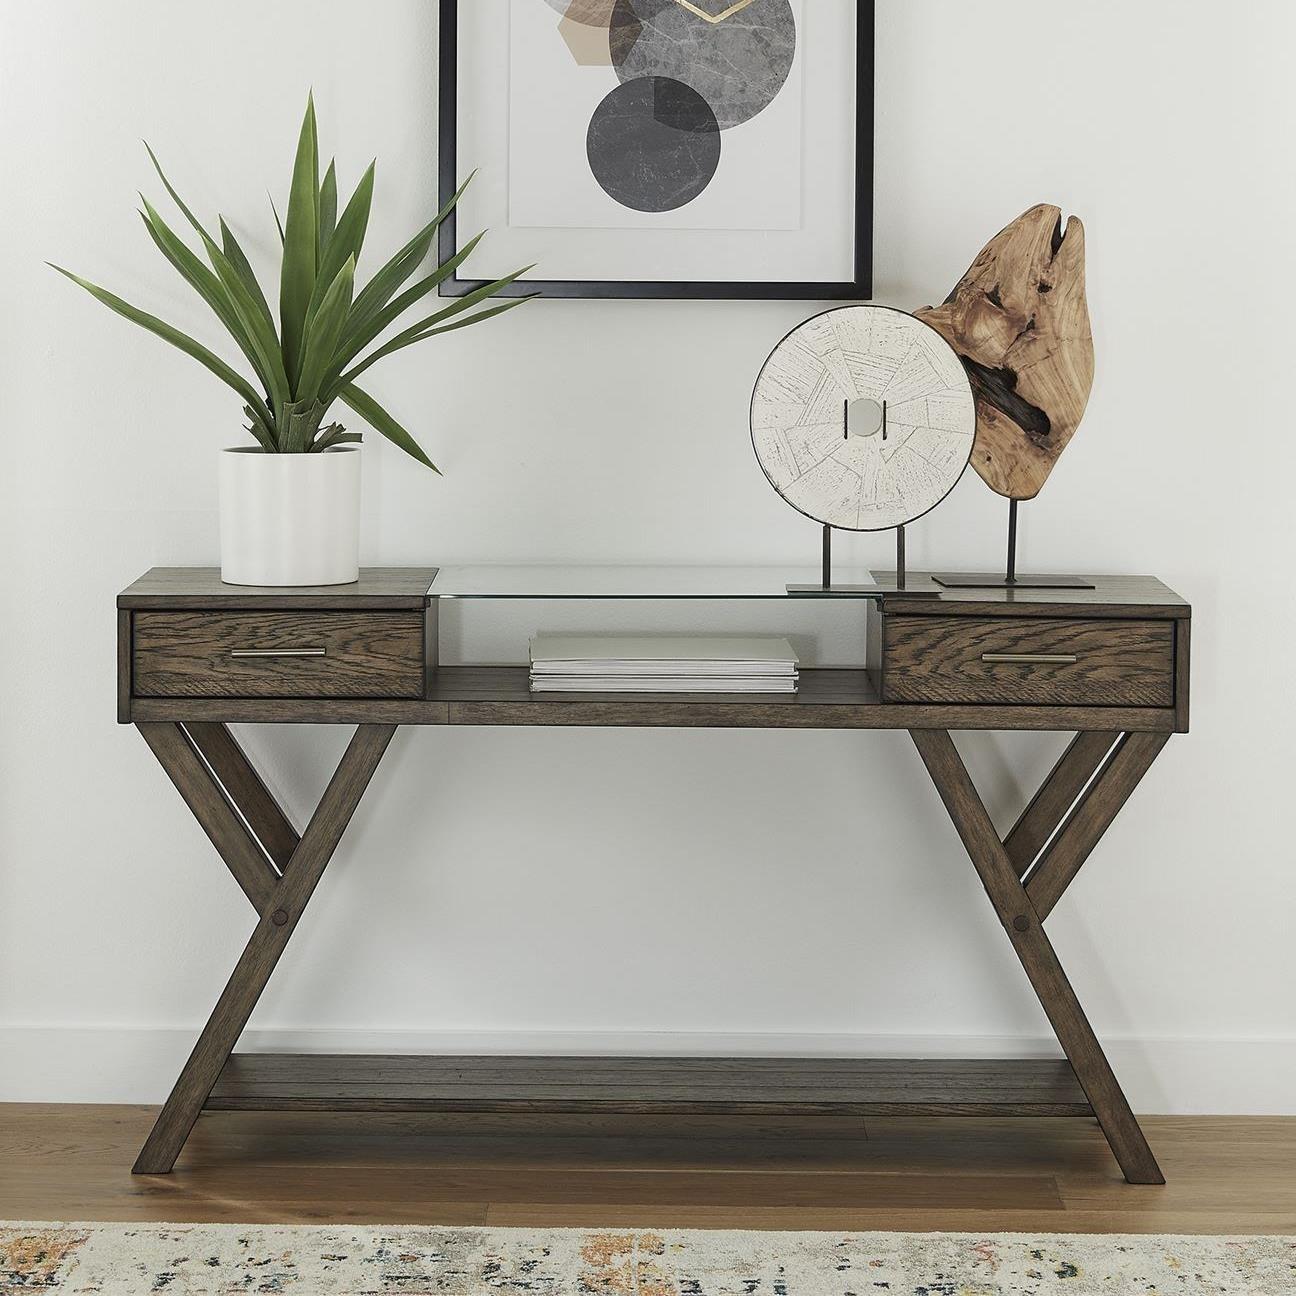 Lennox Drawer Sofa Table by Sarah Randolph Designs at Virginia Furniture Market